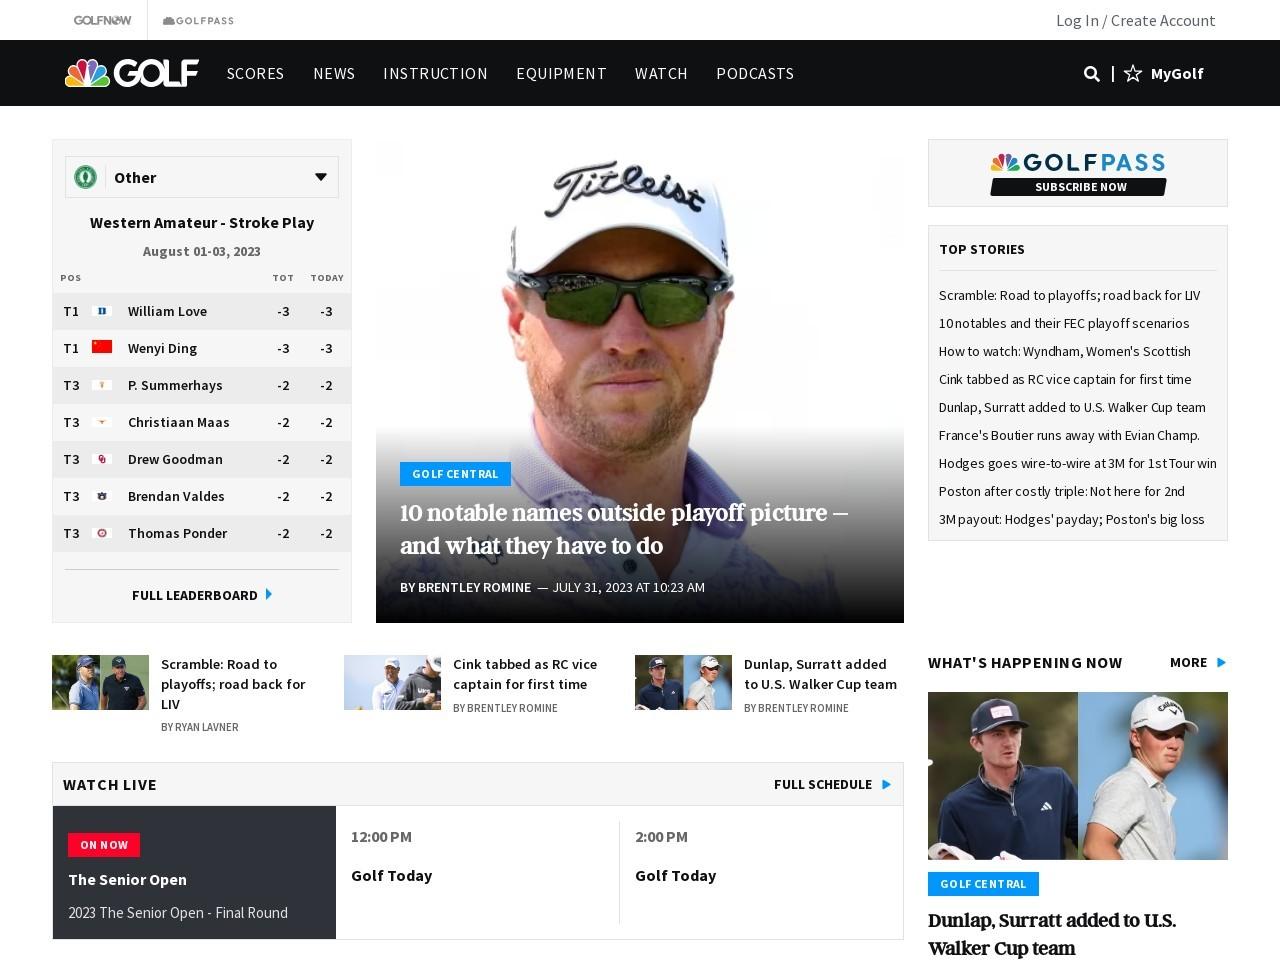 PGA of America to Follow PGA Tour's Lead on Anchoring Ban